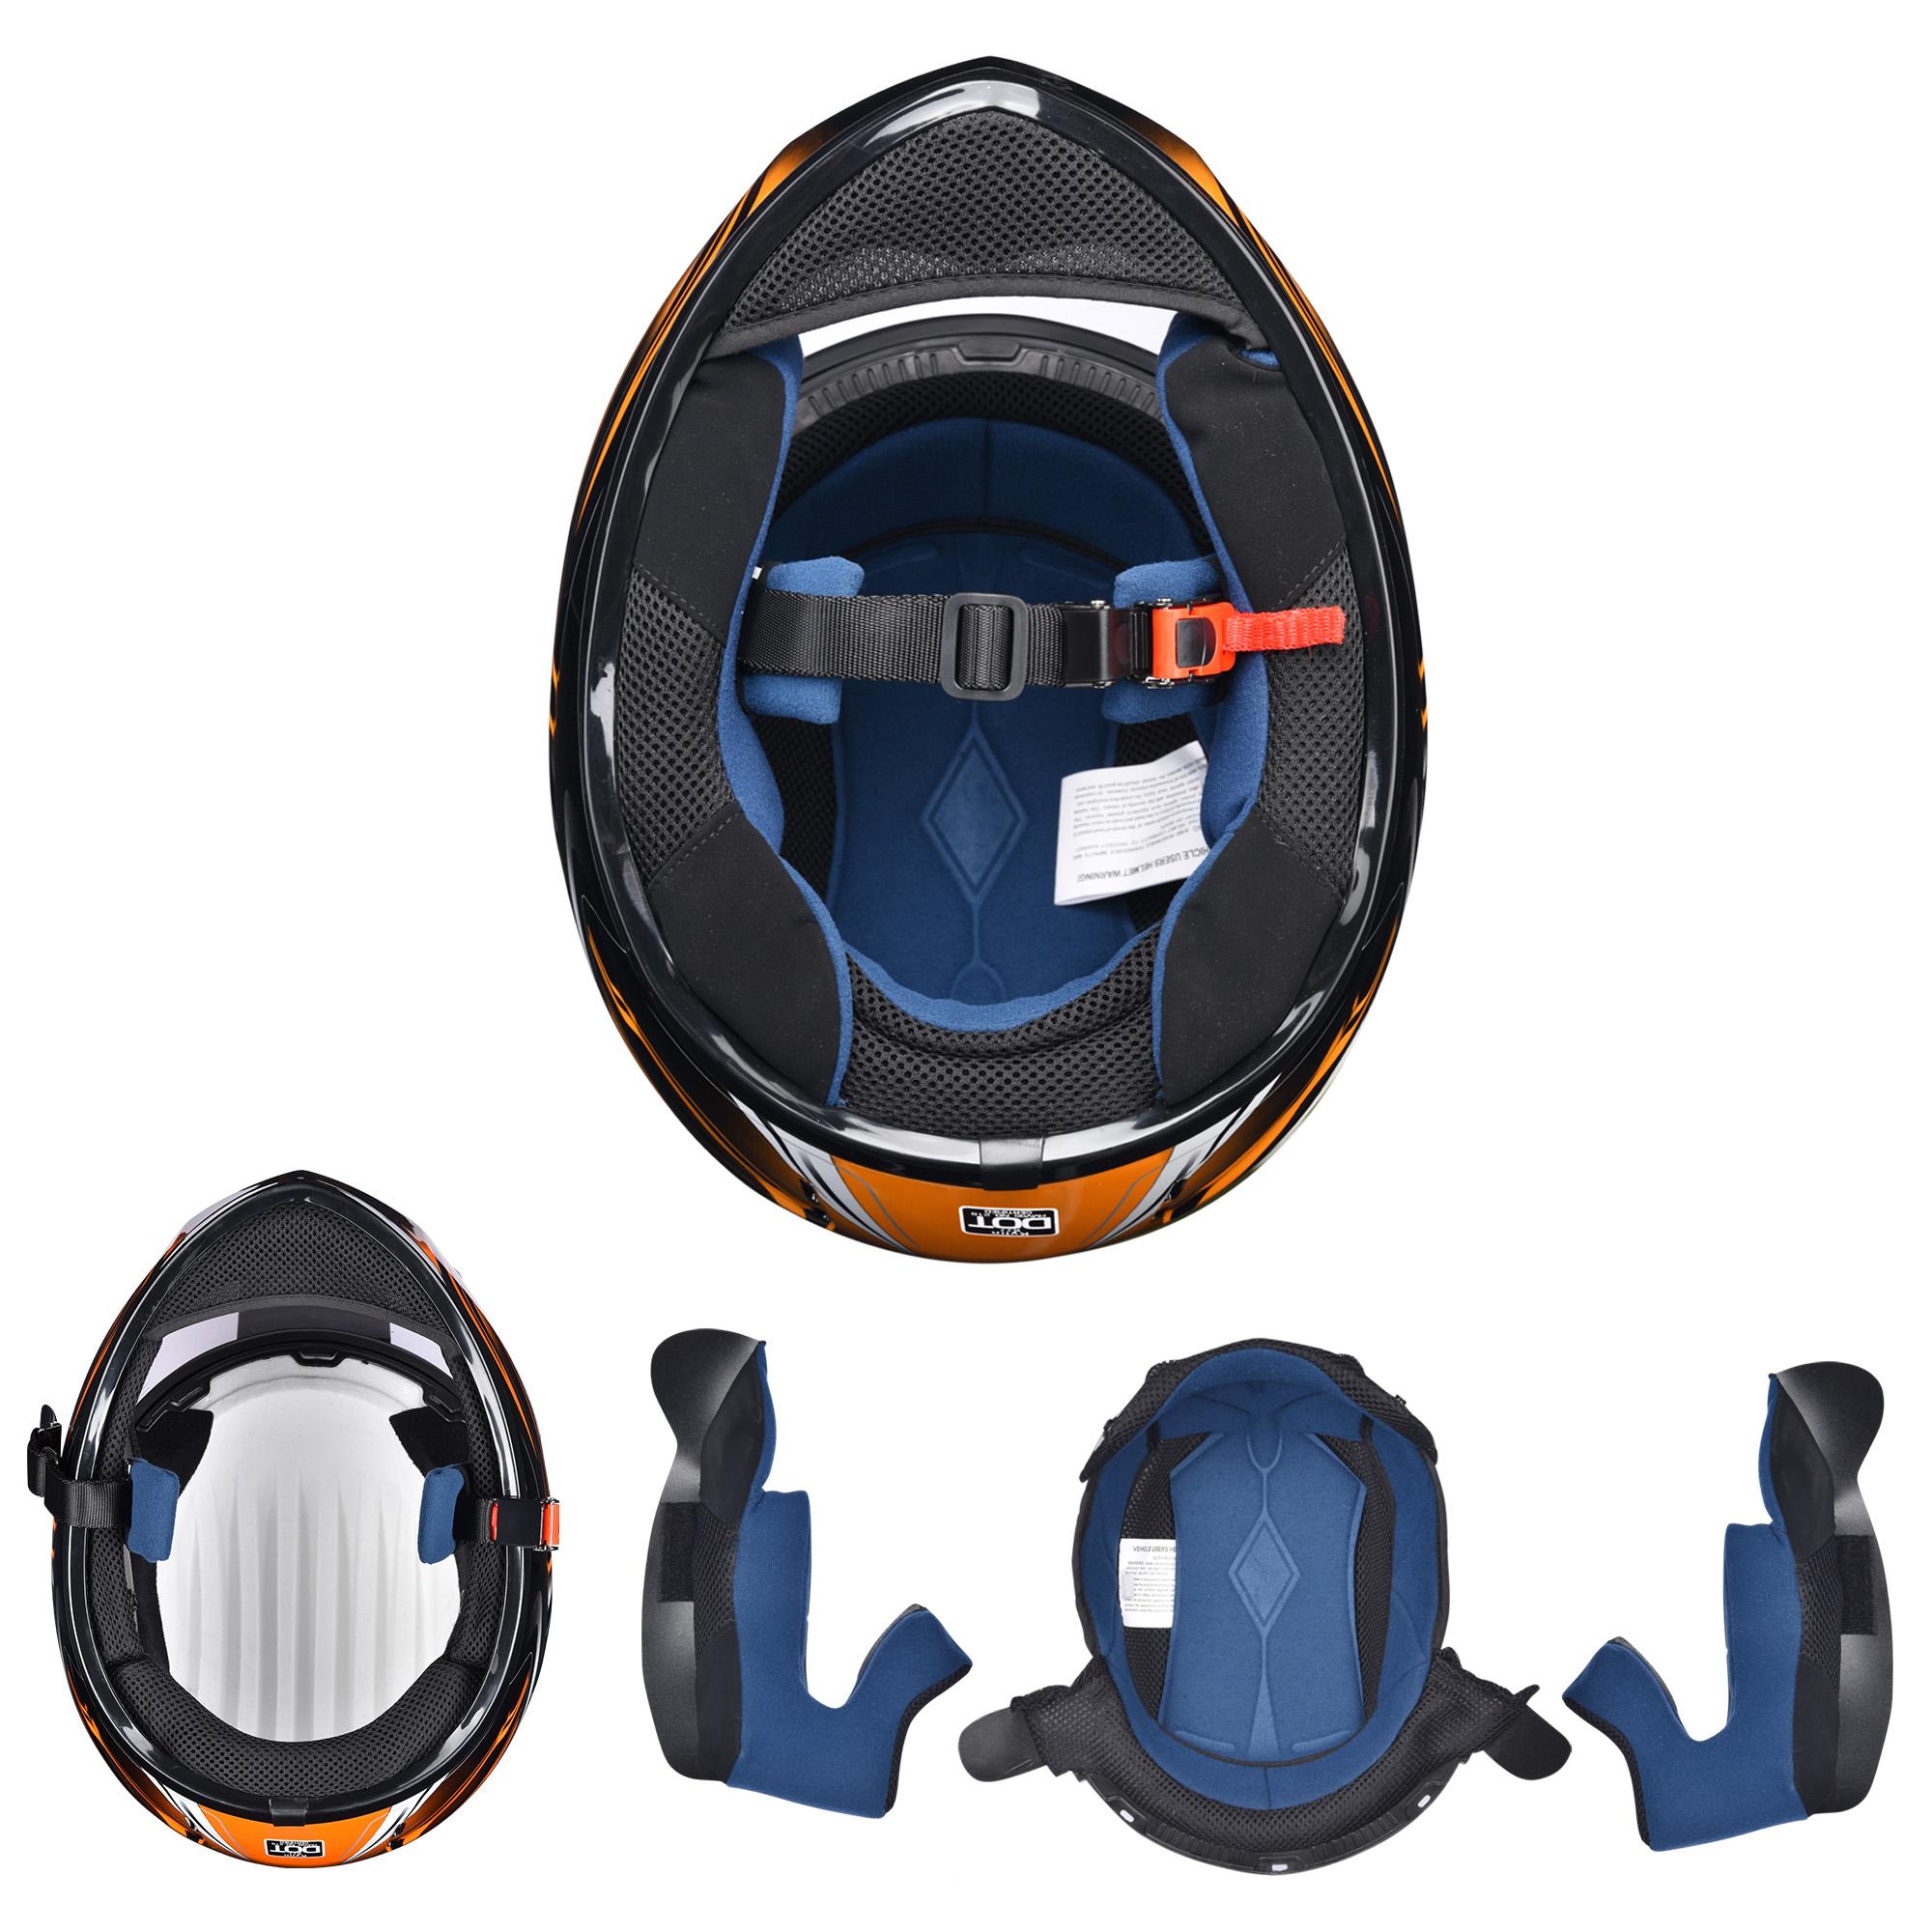 miniature 81 - AHR K12 Full Face Motorcycle Helmet DOT Air Vents Clear Visor Racing S M L XL